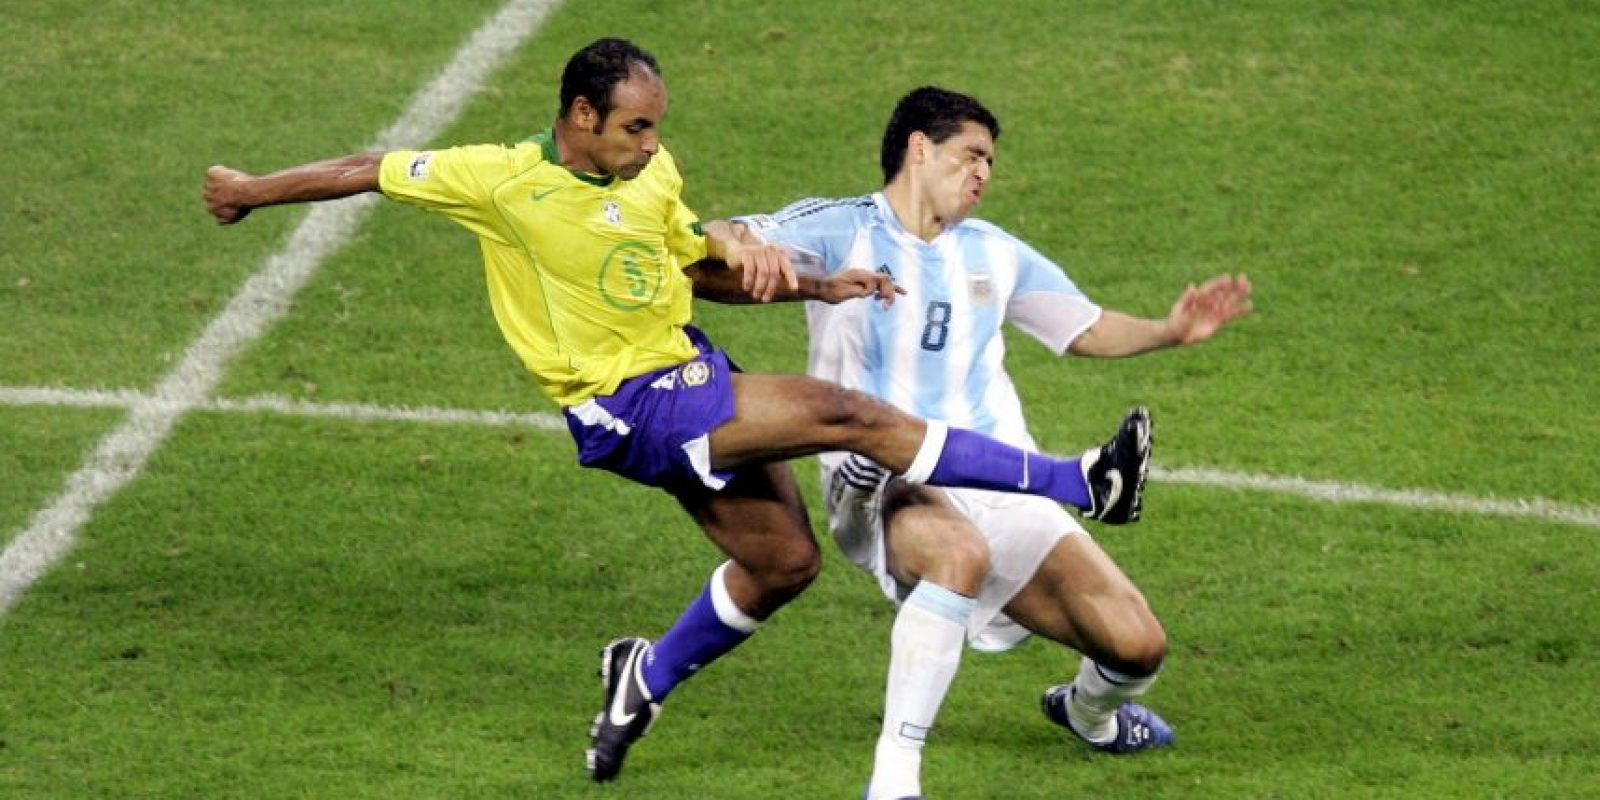 Saltamos a 2005, final de la Copa Confederaciones Foto:Getty Images